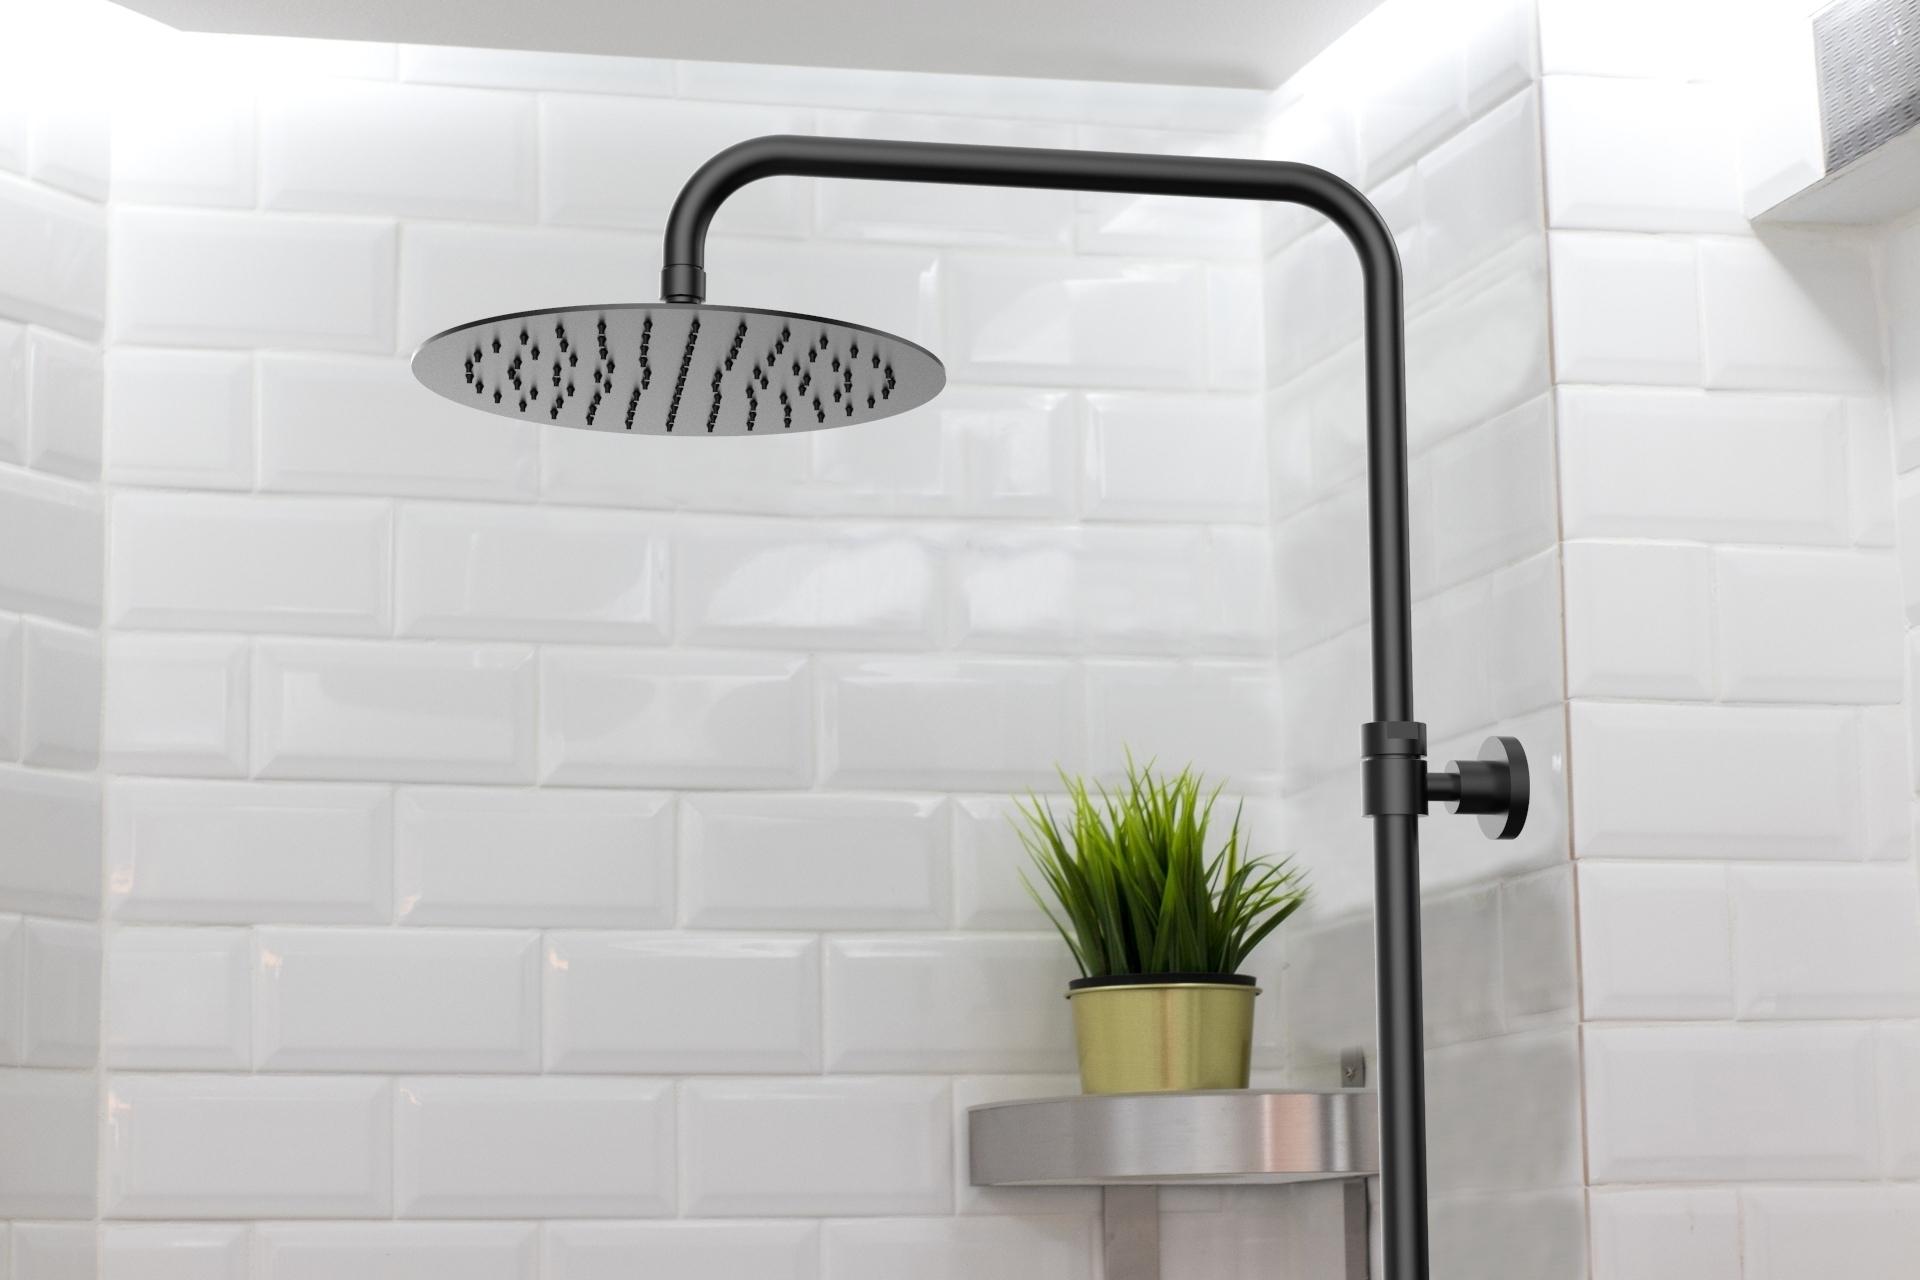 Zwarte kranen in de badkamer